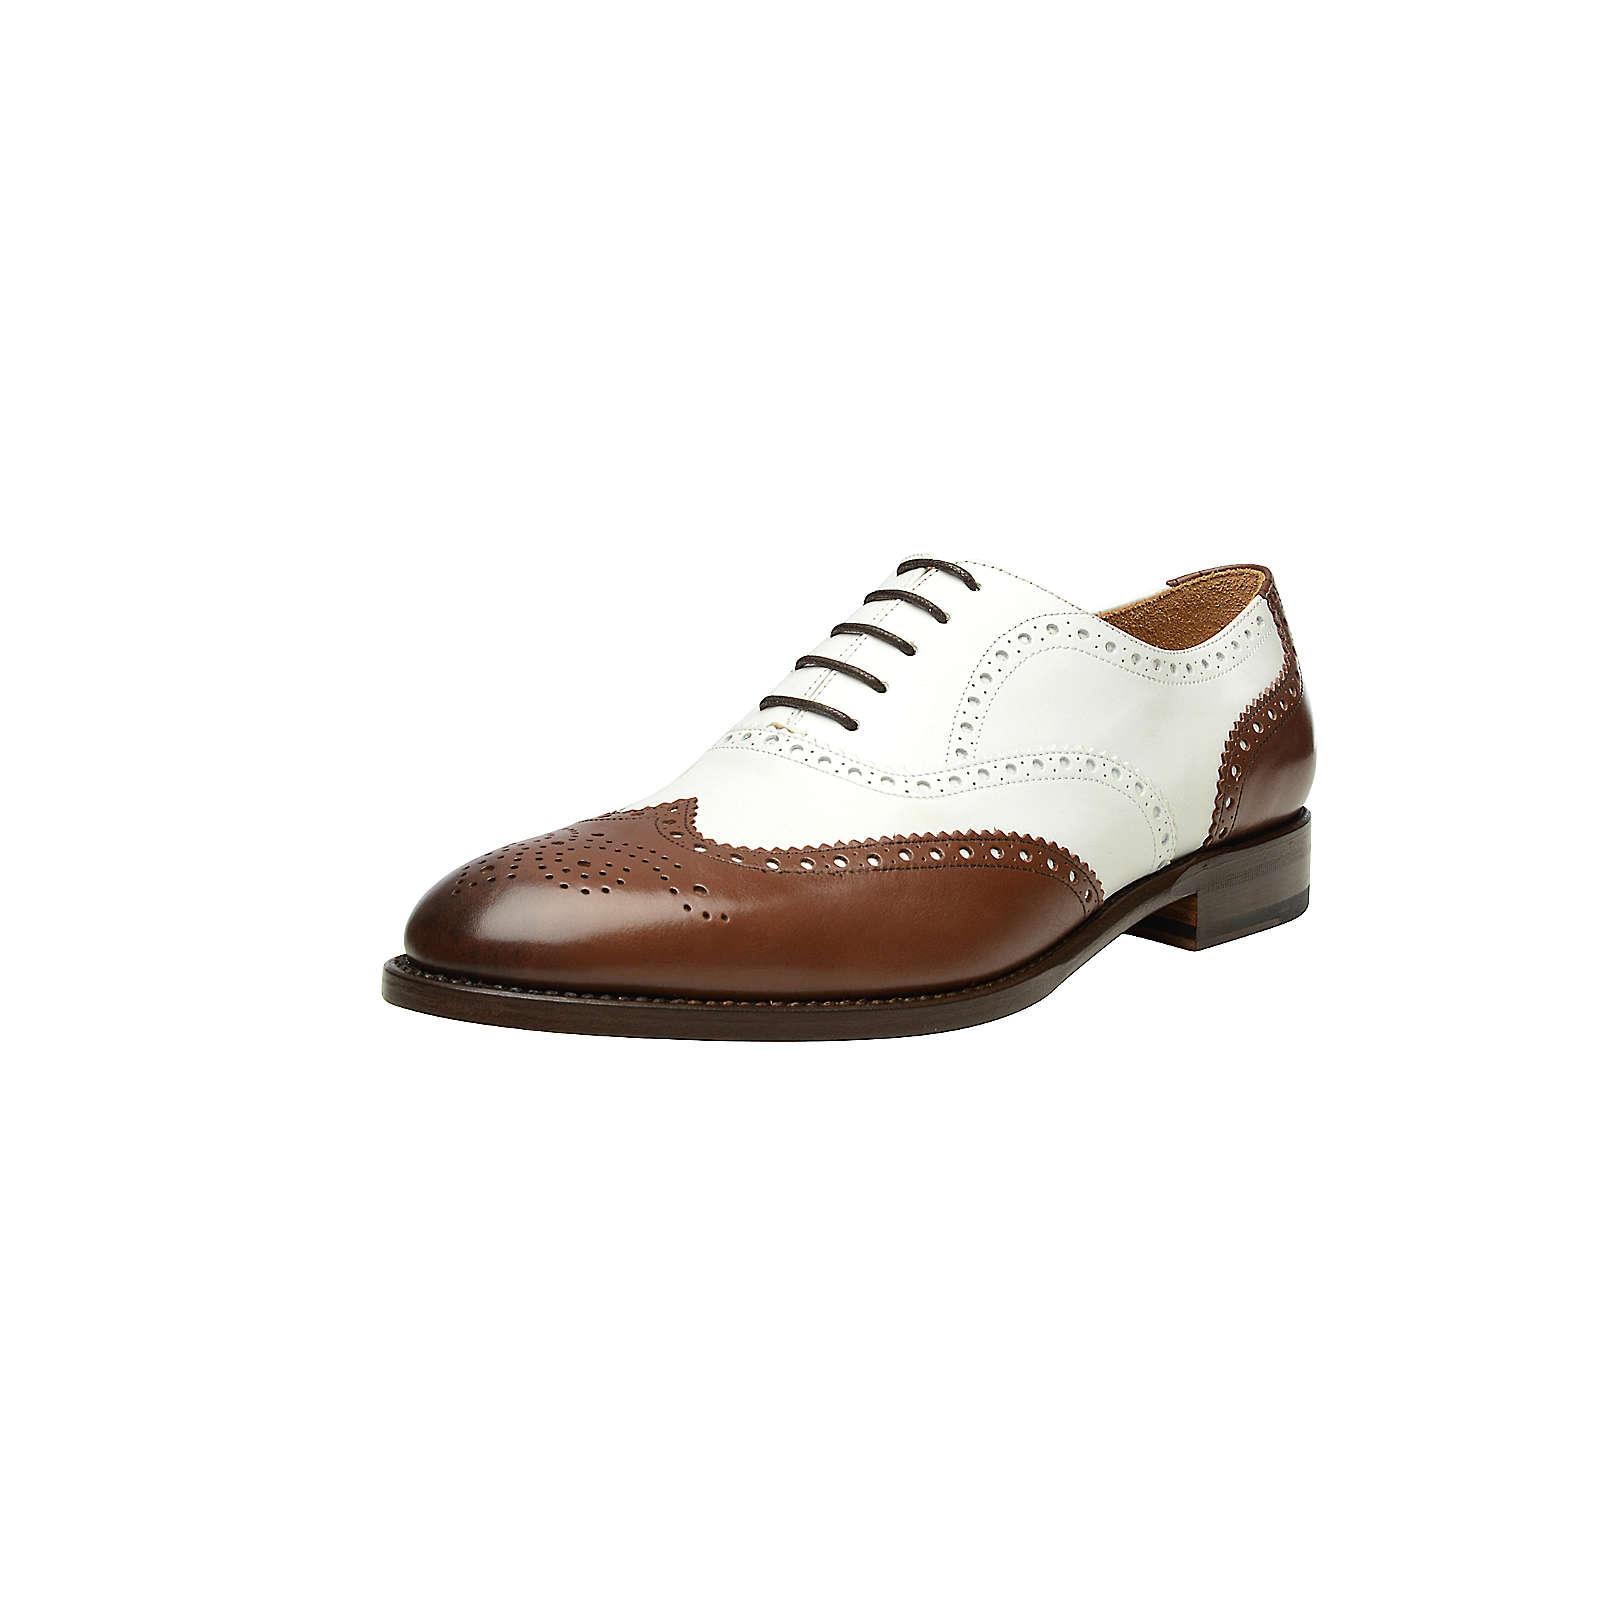 SHOEPASSION No. 384 Business Schuhe dunkelbraun Herren Gr. 41